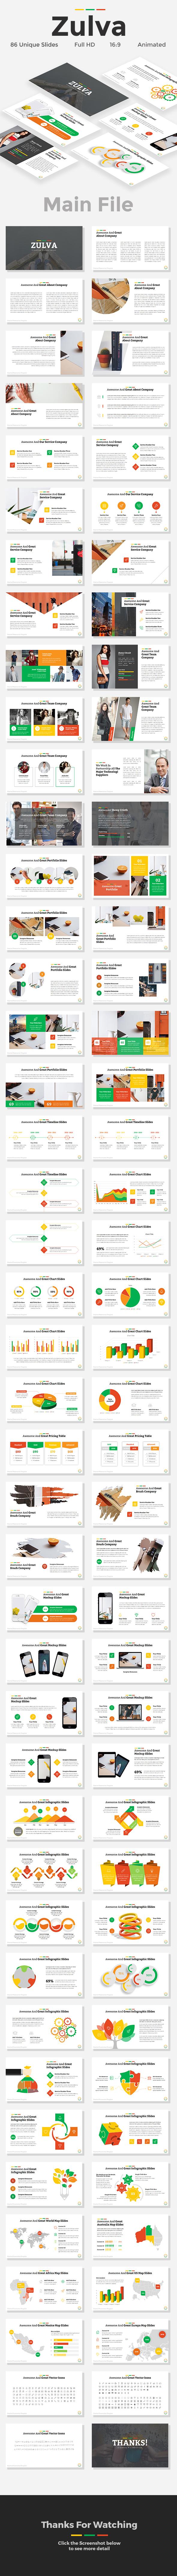 Zulva - Creative Keynote Template - Creative Keynote Templates